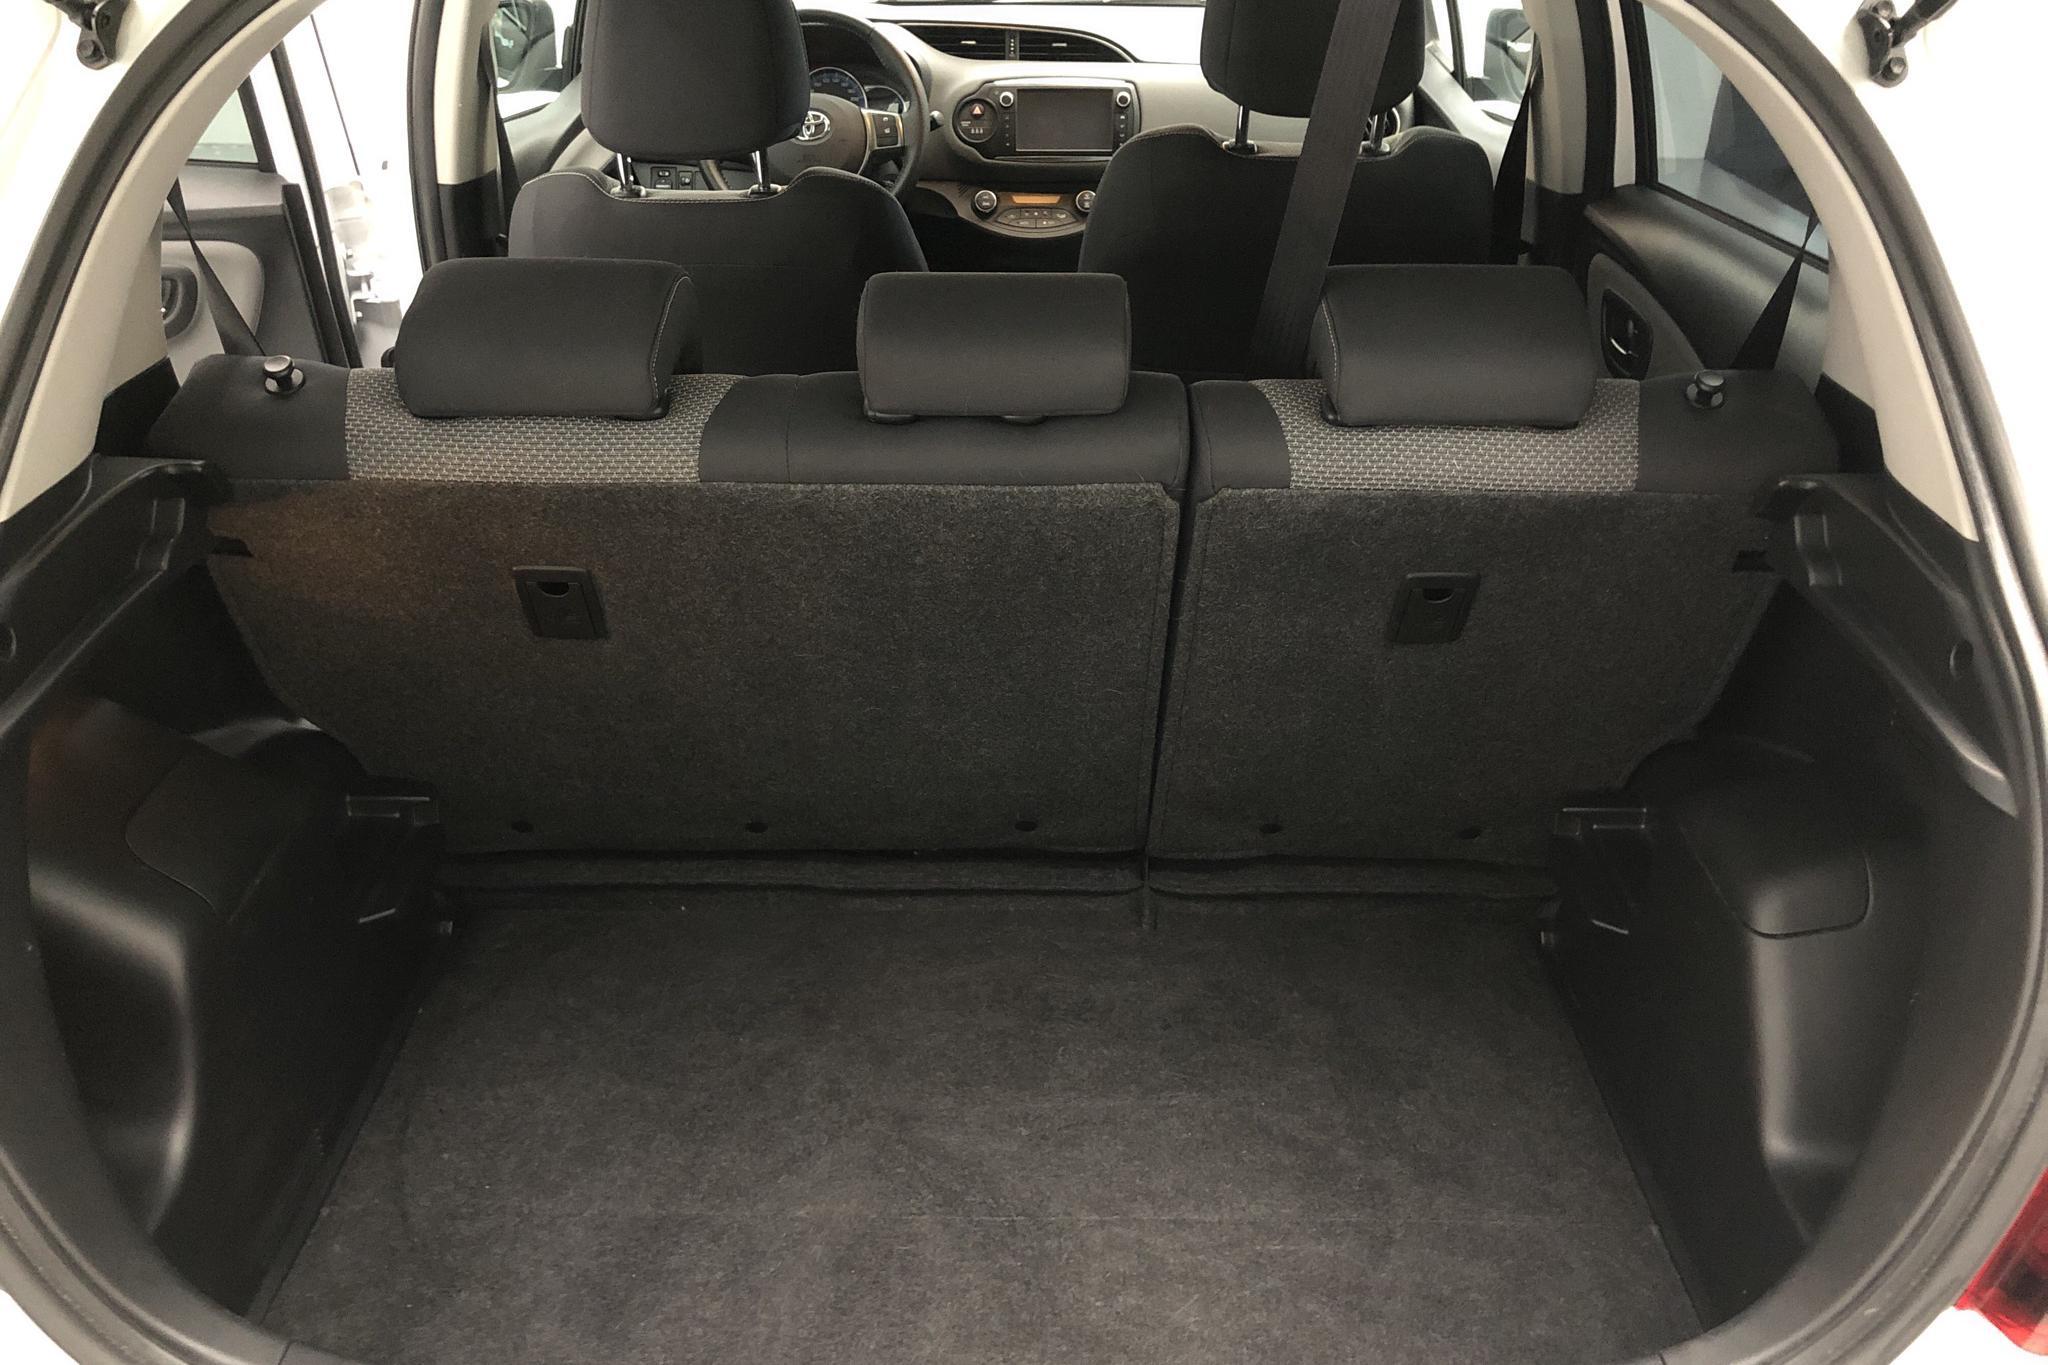 Toyota Yaris 1.5 HSD 5dr (75hk) - 4 874 mil - Automat - vit - 2015